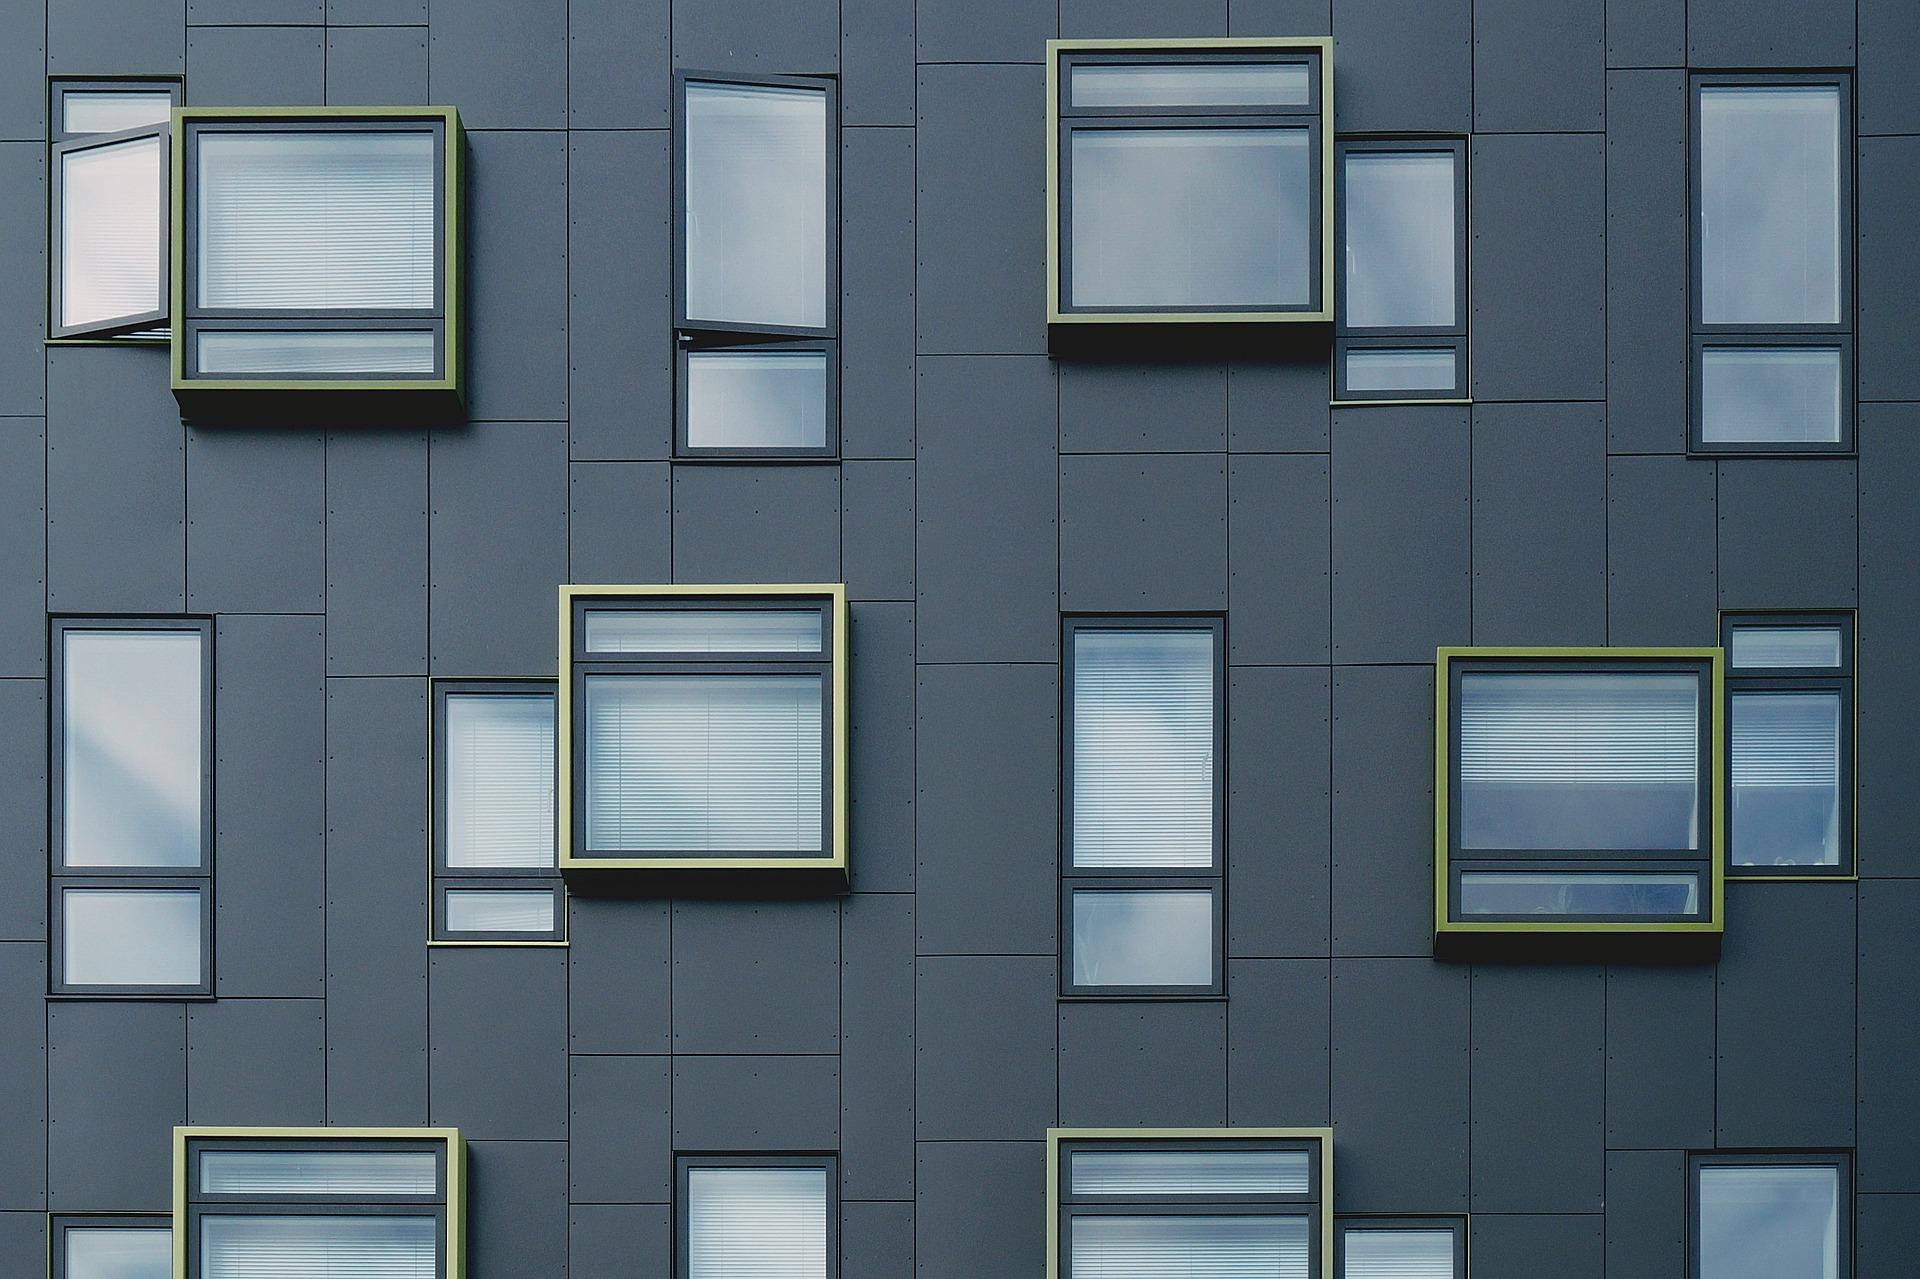 building-1245984_1920.jpg